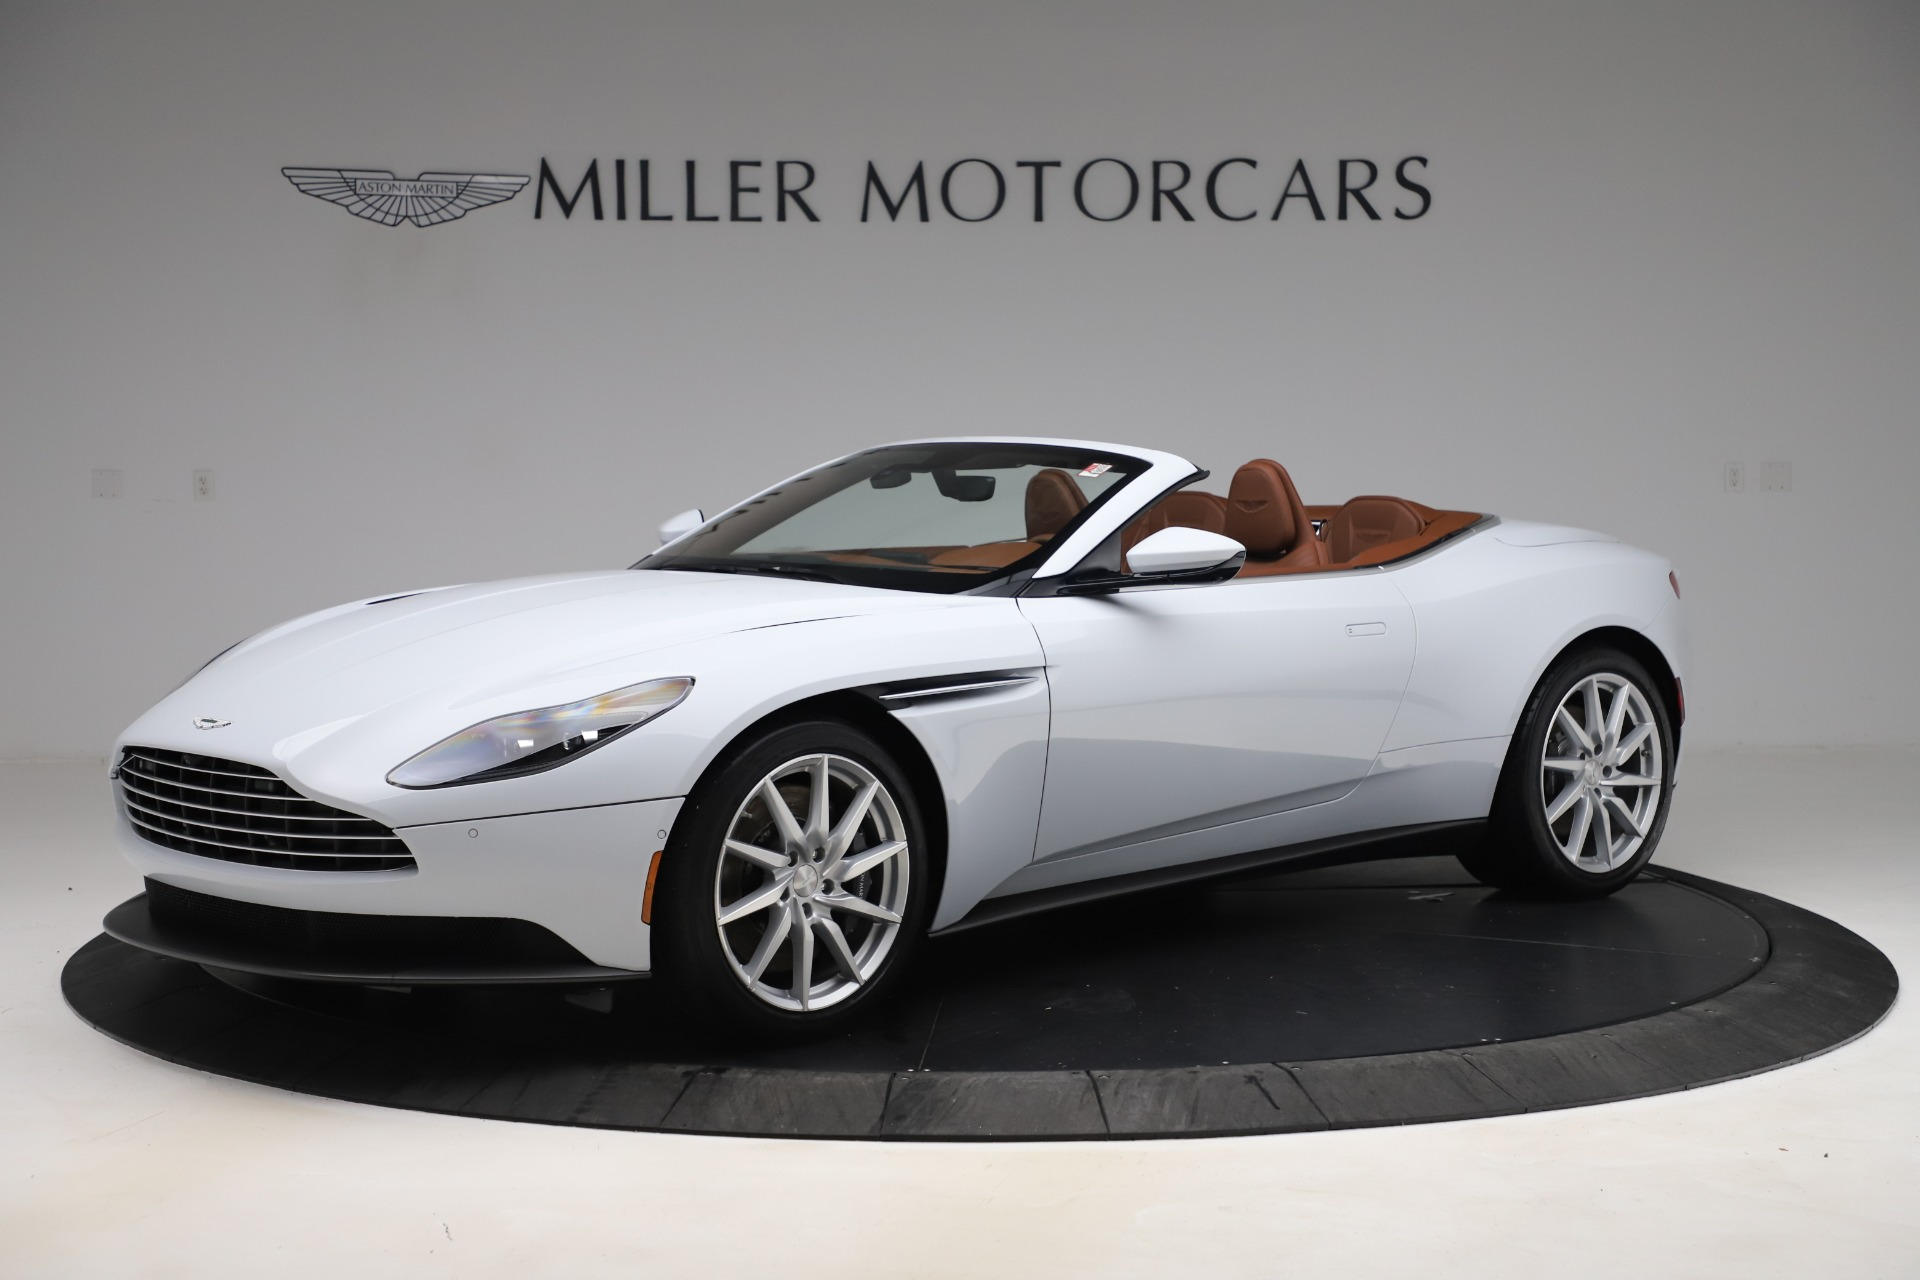 New 2020 Aston Martin DB11 Volante Convertible for sale Sold at Alfa Romeo of Greenwich in Greenwich CT 06830 1